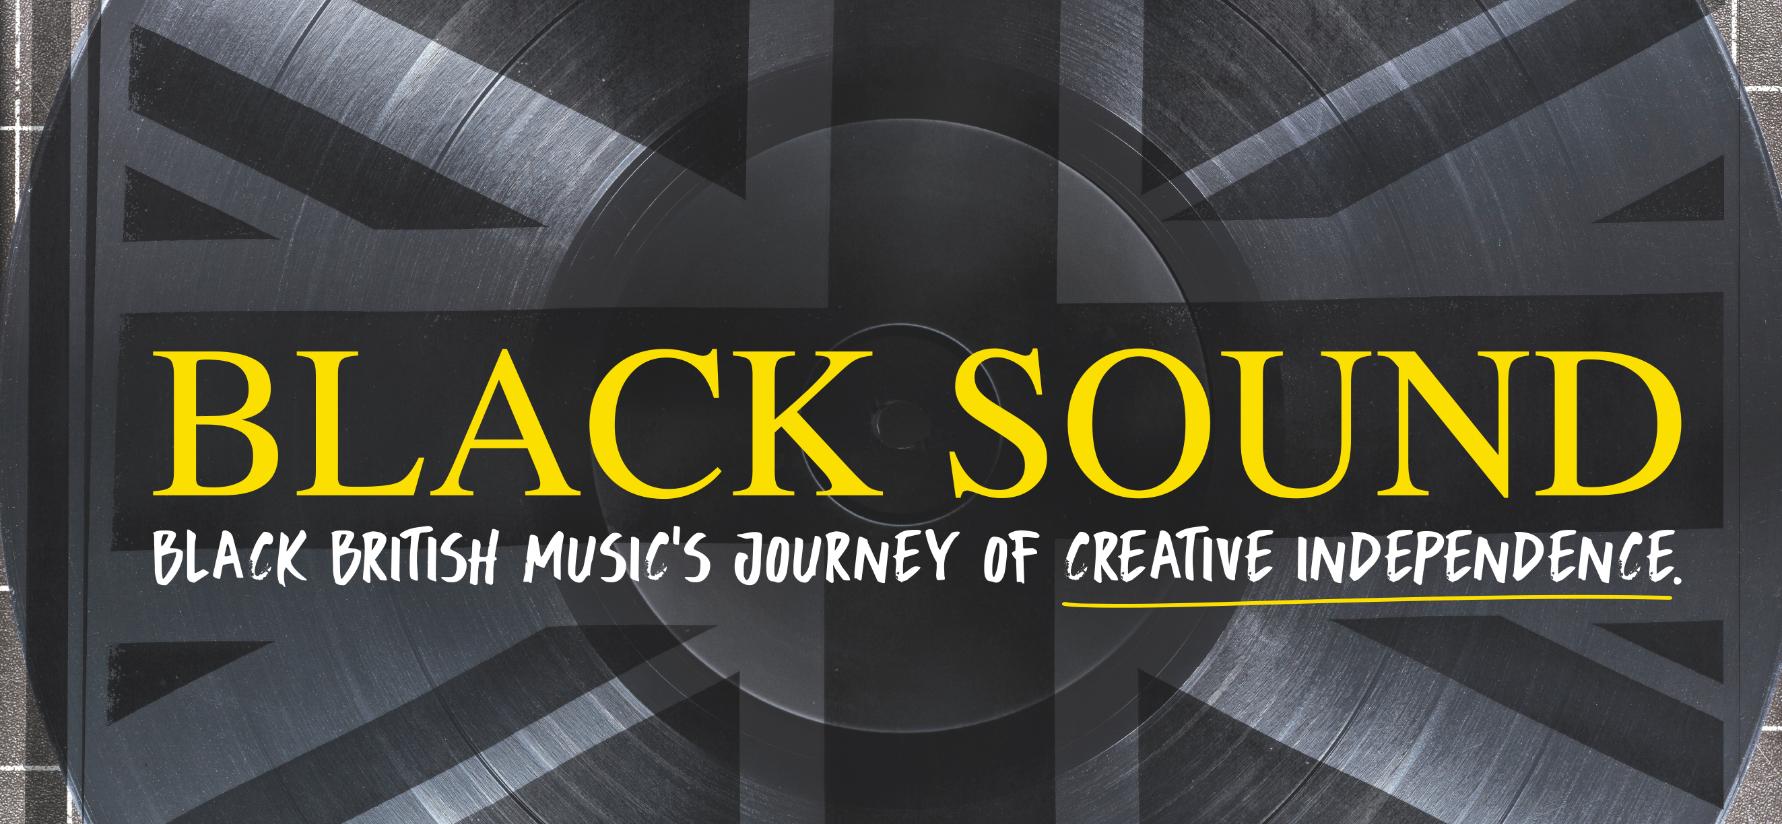 Black Sound_Window_Front_6090x2330mm (at